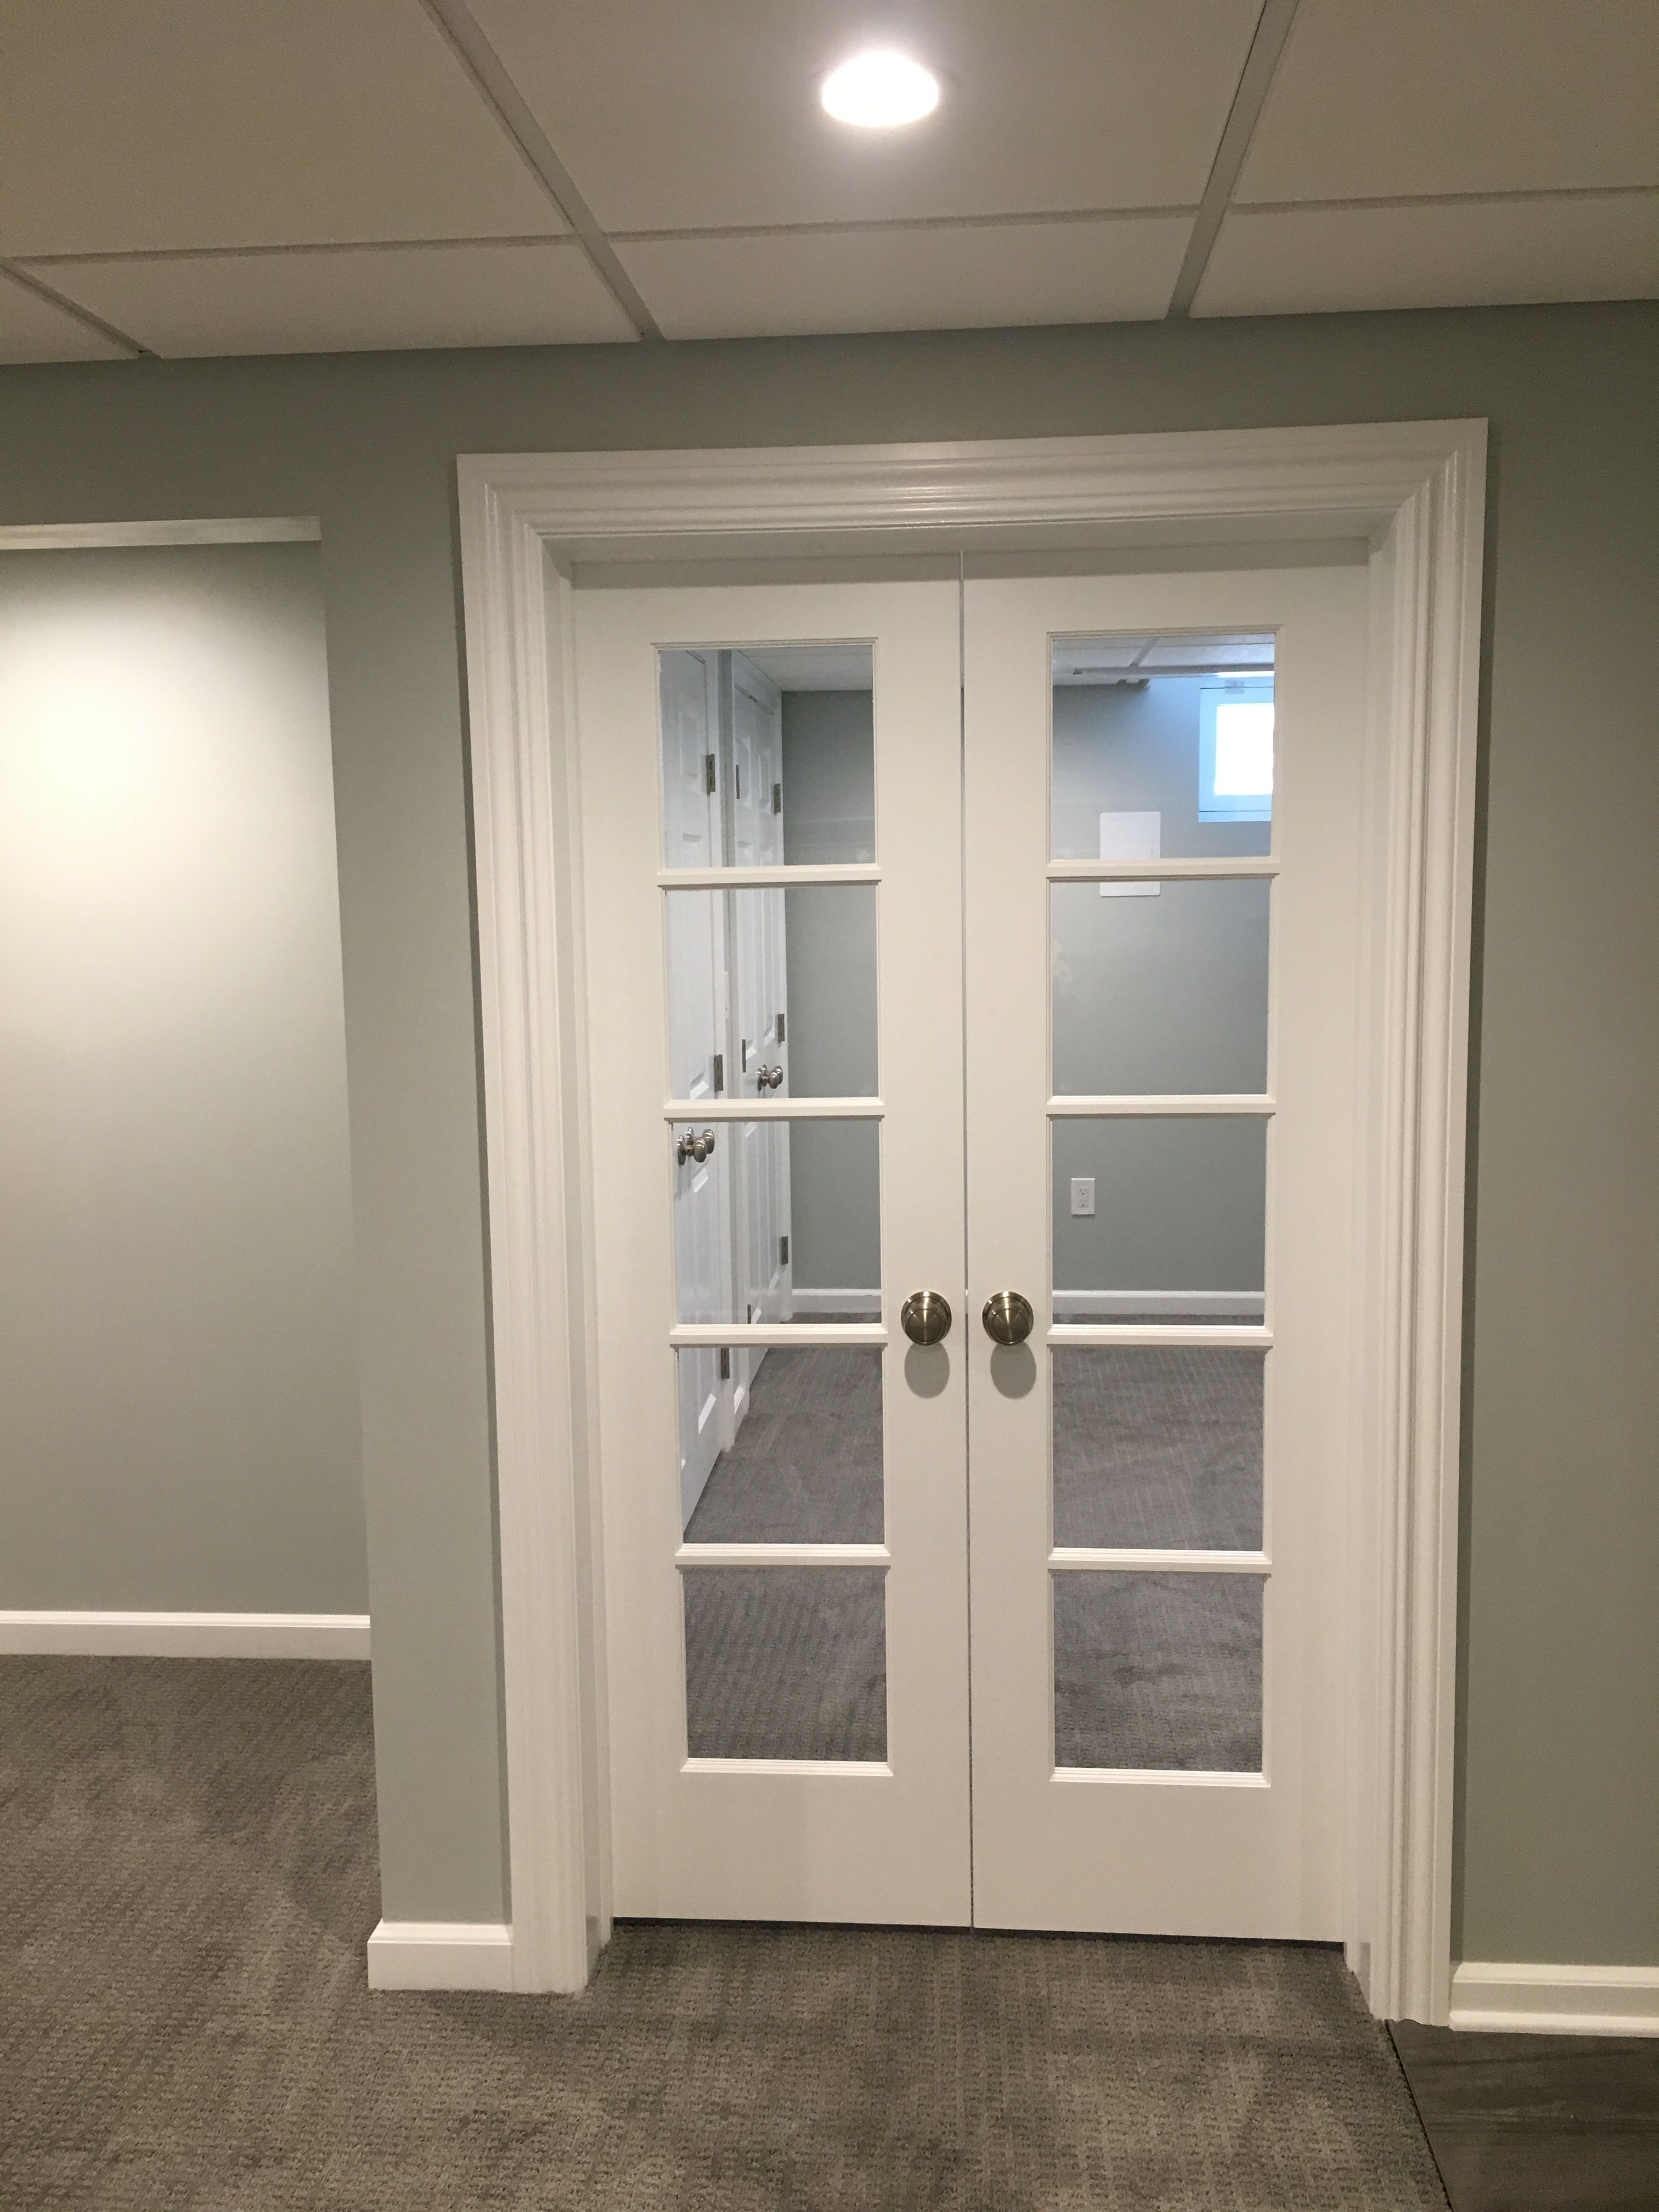 Basement Study Room: Basement Remodel French Doors To Study